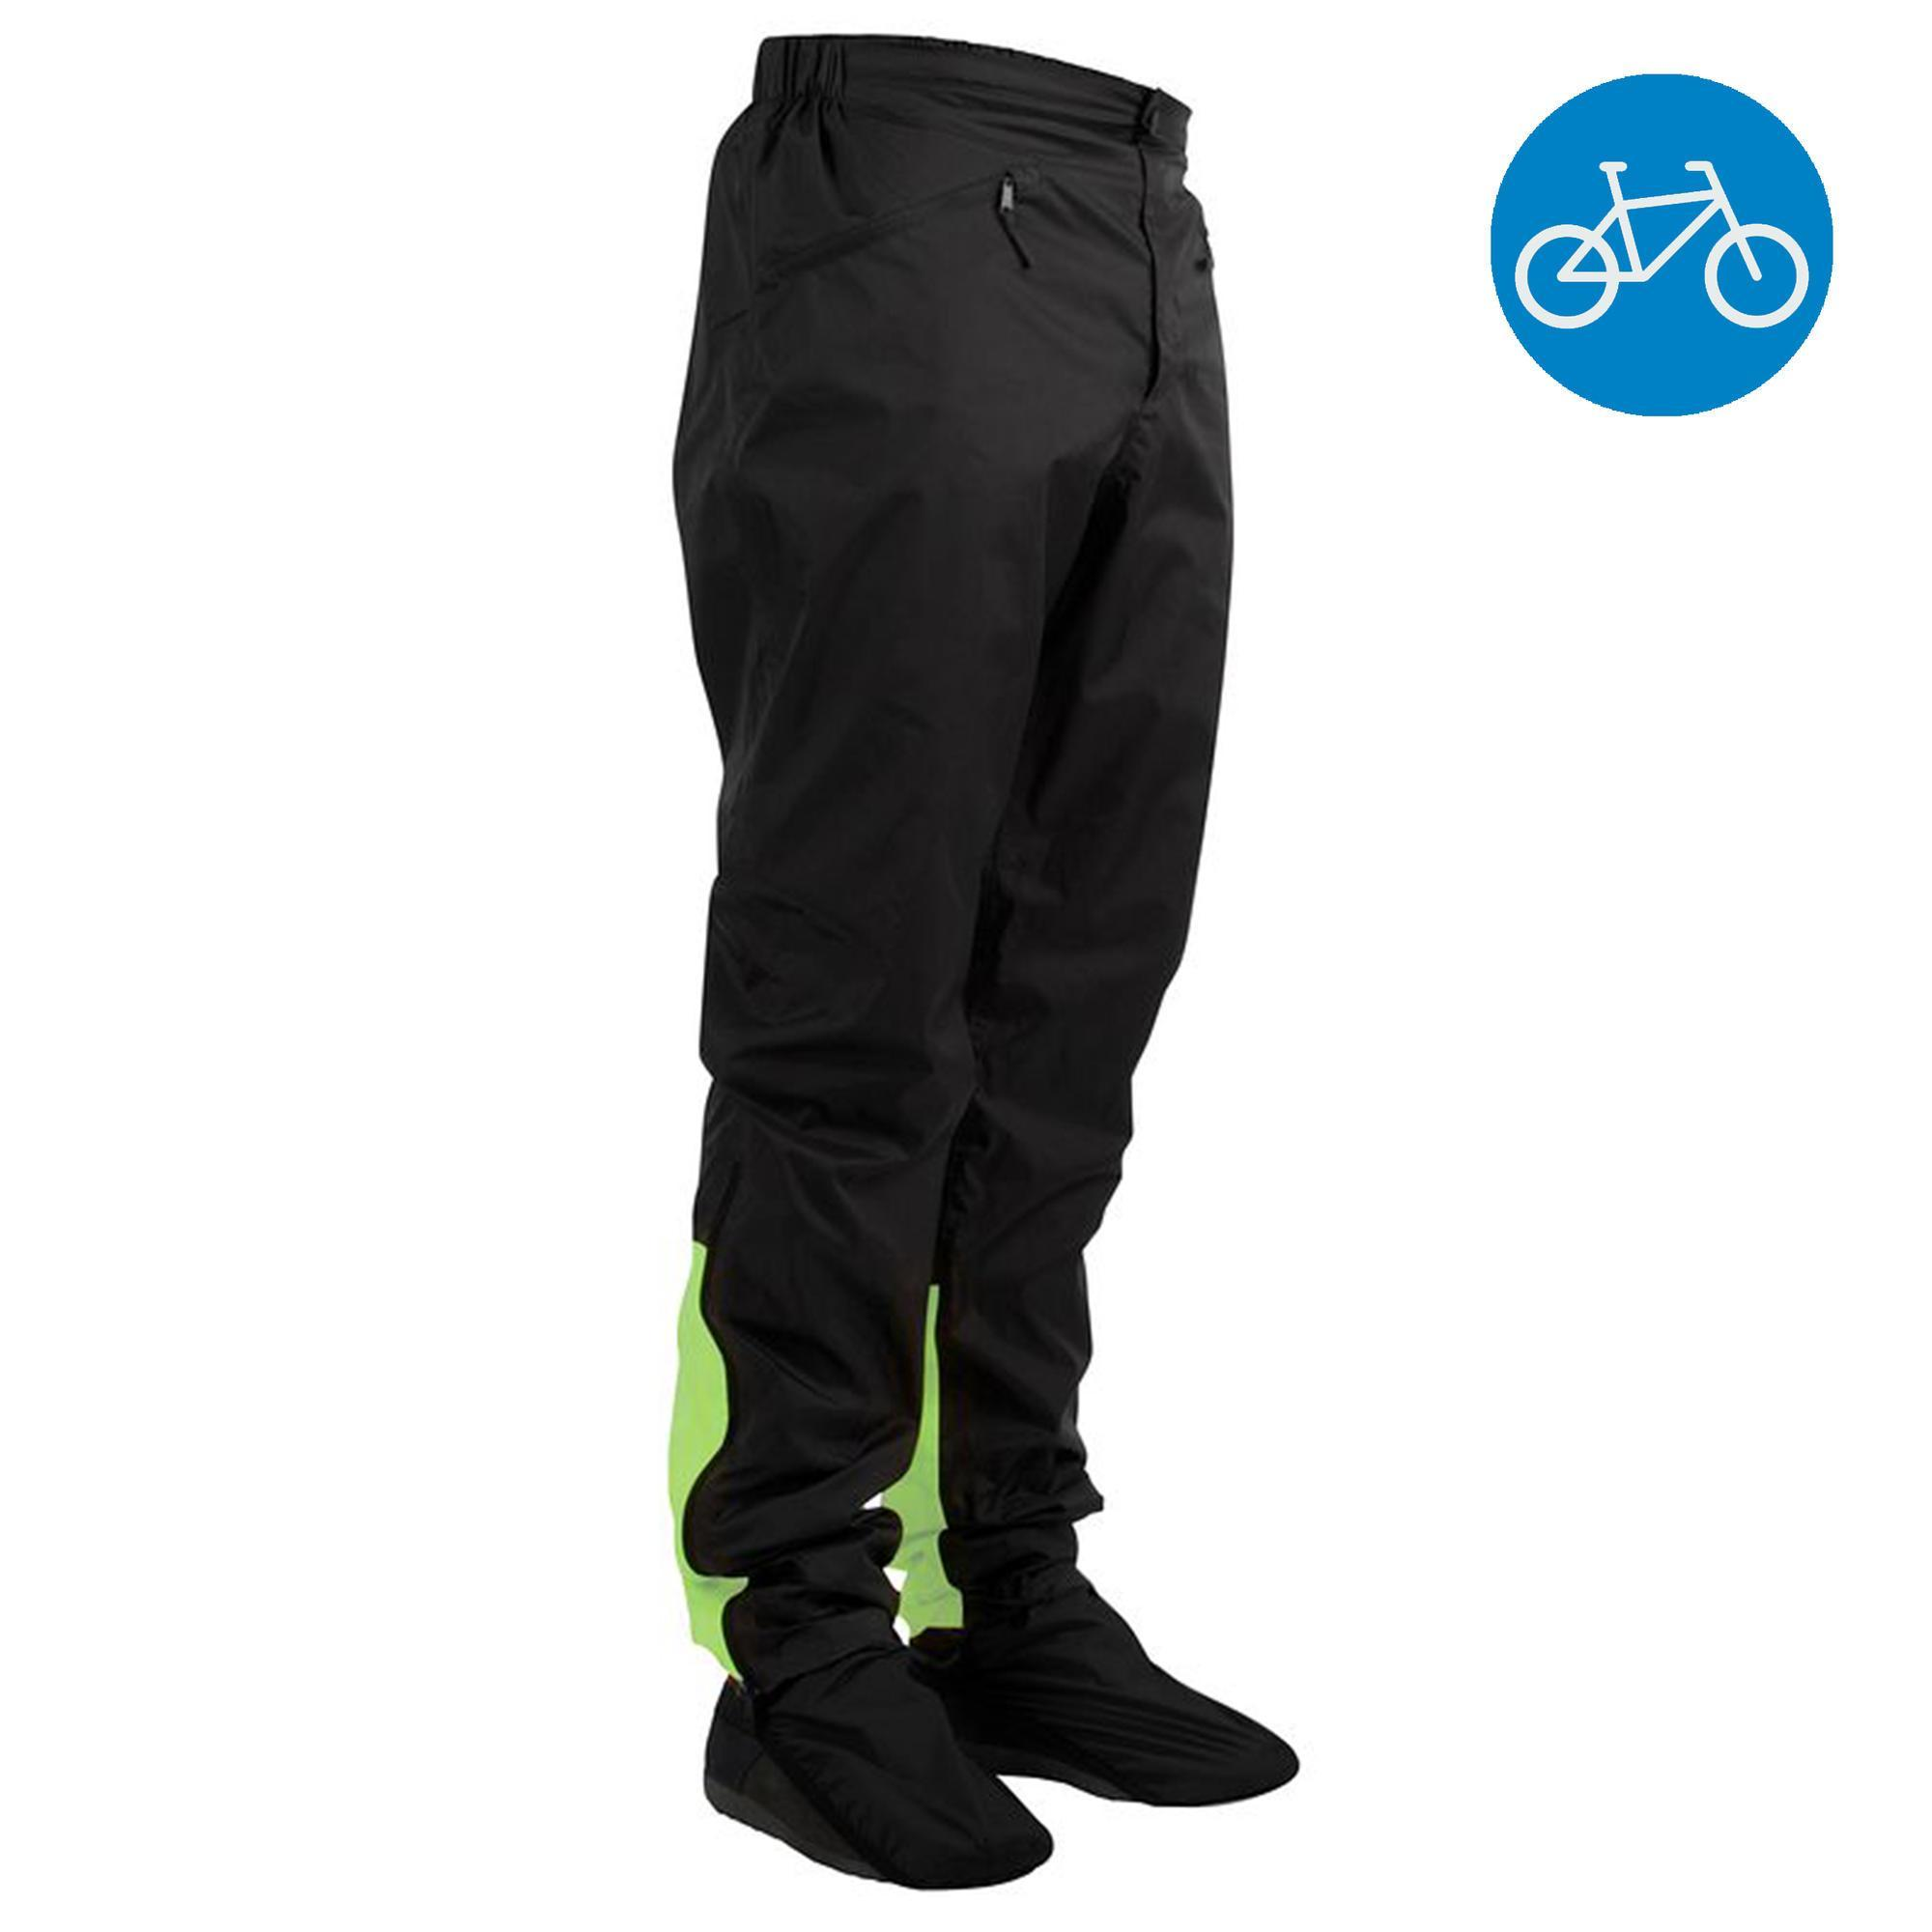 Fahrrad-Regenhose City 900 schwarz/neongelb | Sportbekleidung > Sporthosen > Fahrradhosen | B'twin